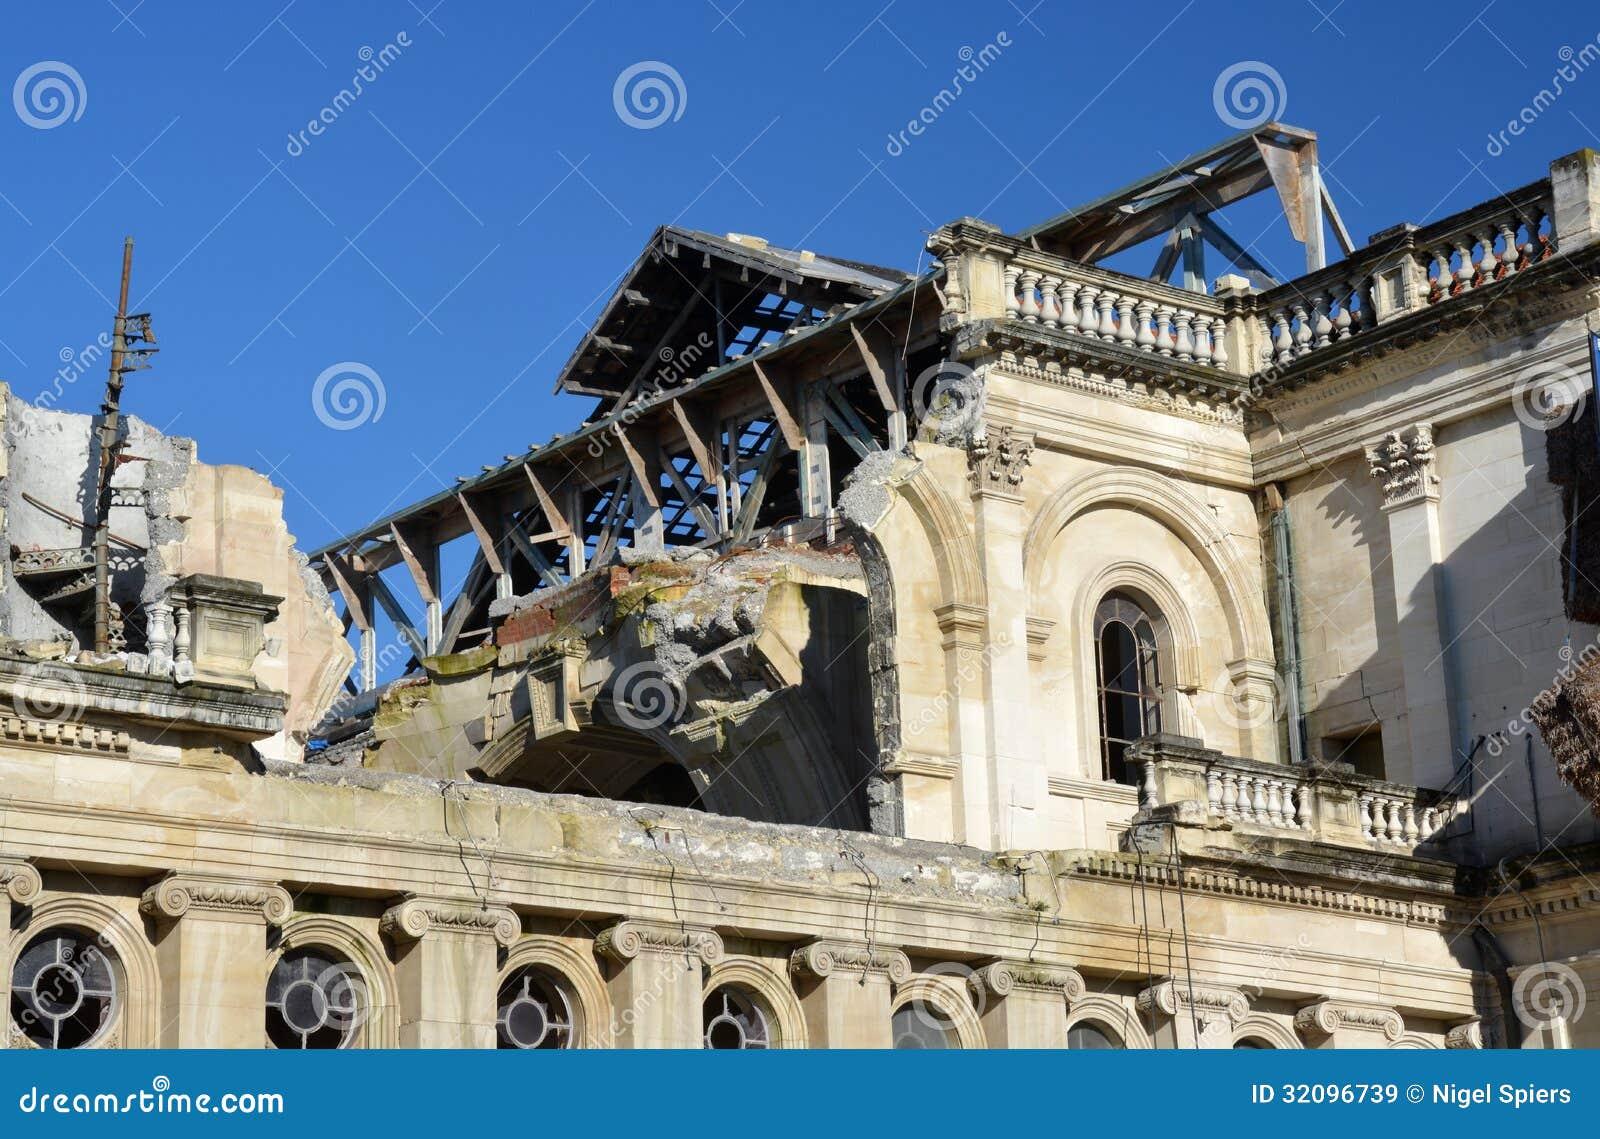 Close-up Detail Of The Damaged Christchurch Catholic